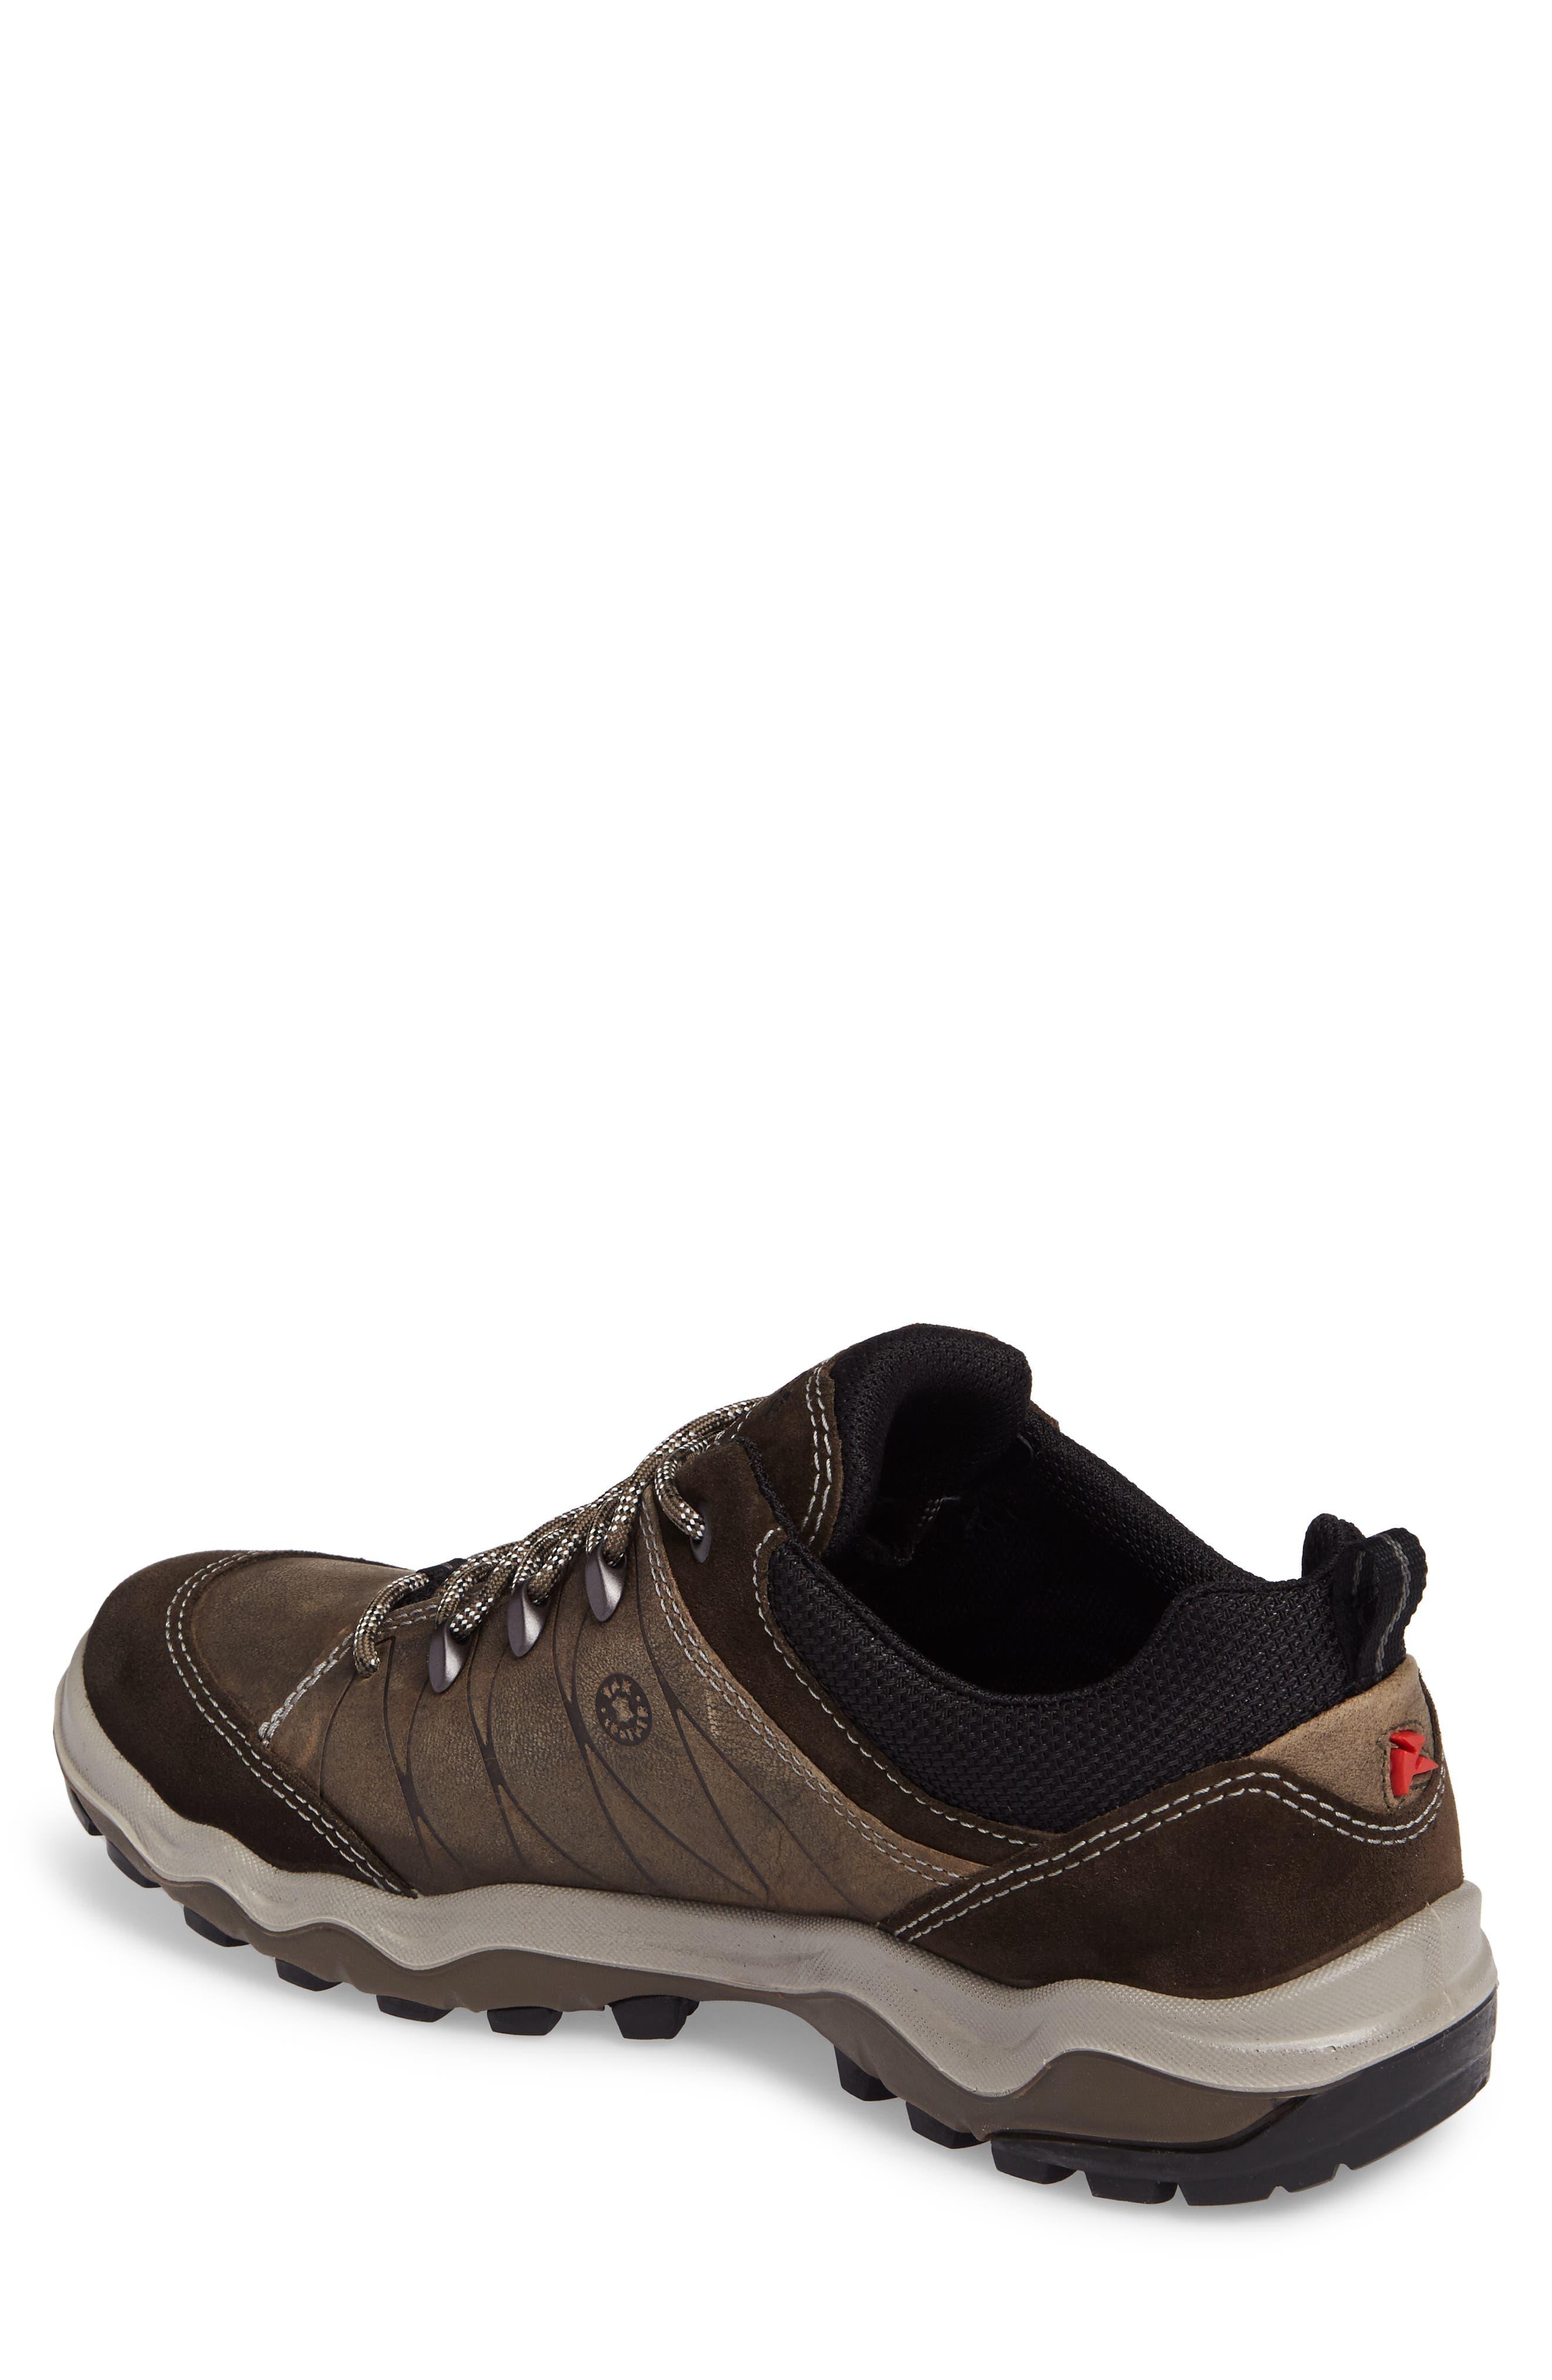 Ulterra GTX Sneaker,                             Alternate thumbnail 2, color,                             Tarmac Suede